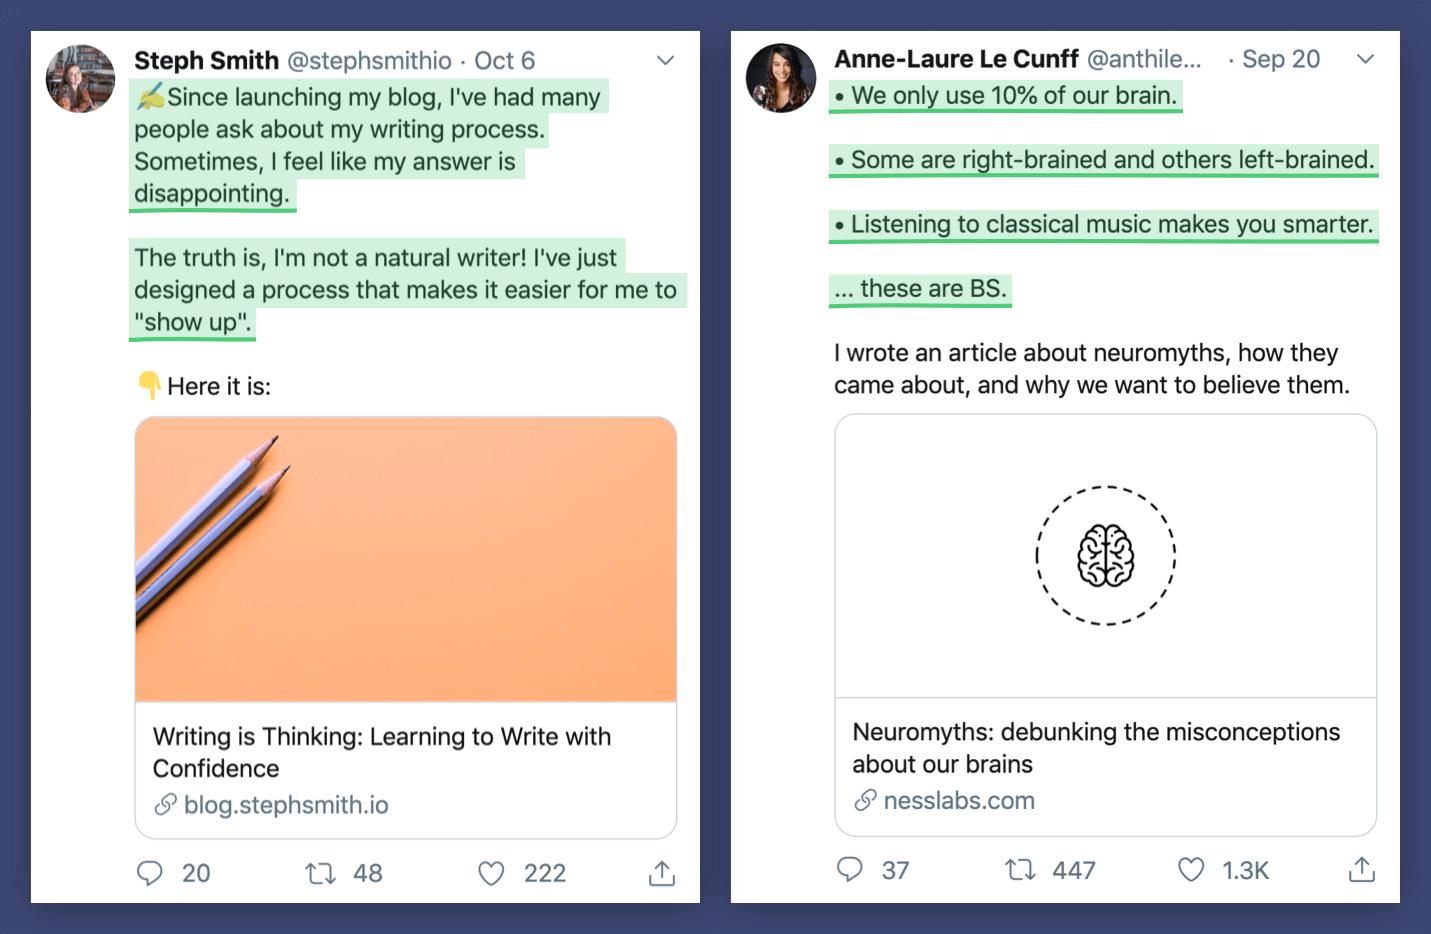 Anne-Laure Le Cunff Tweet